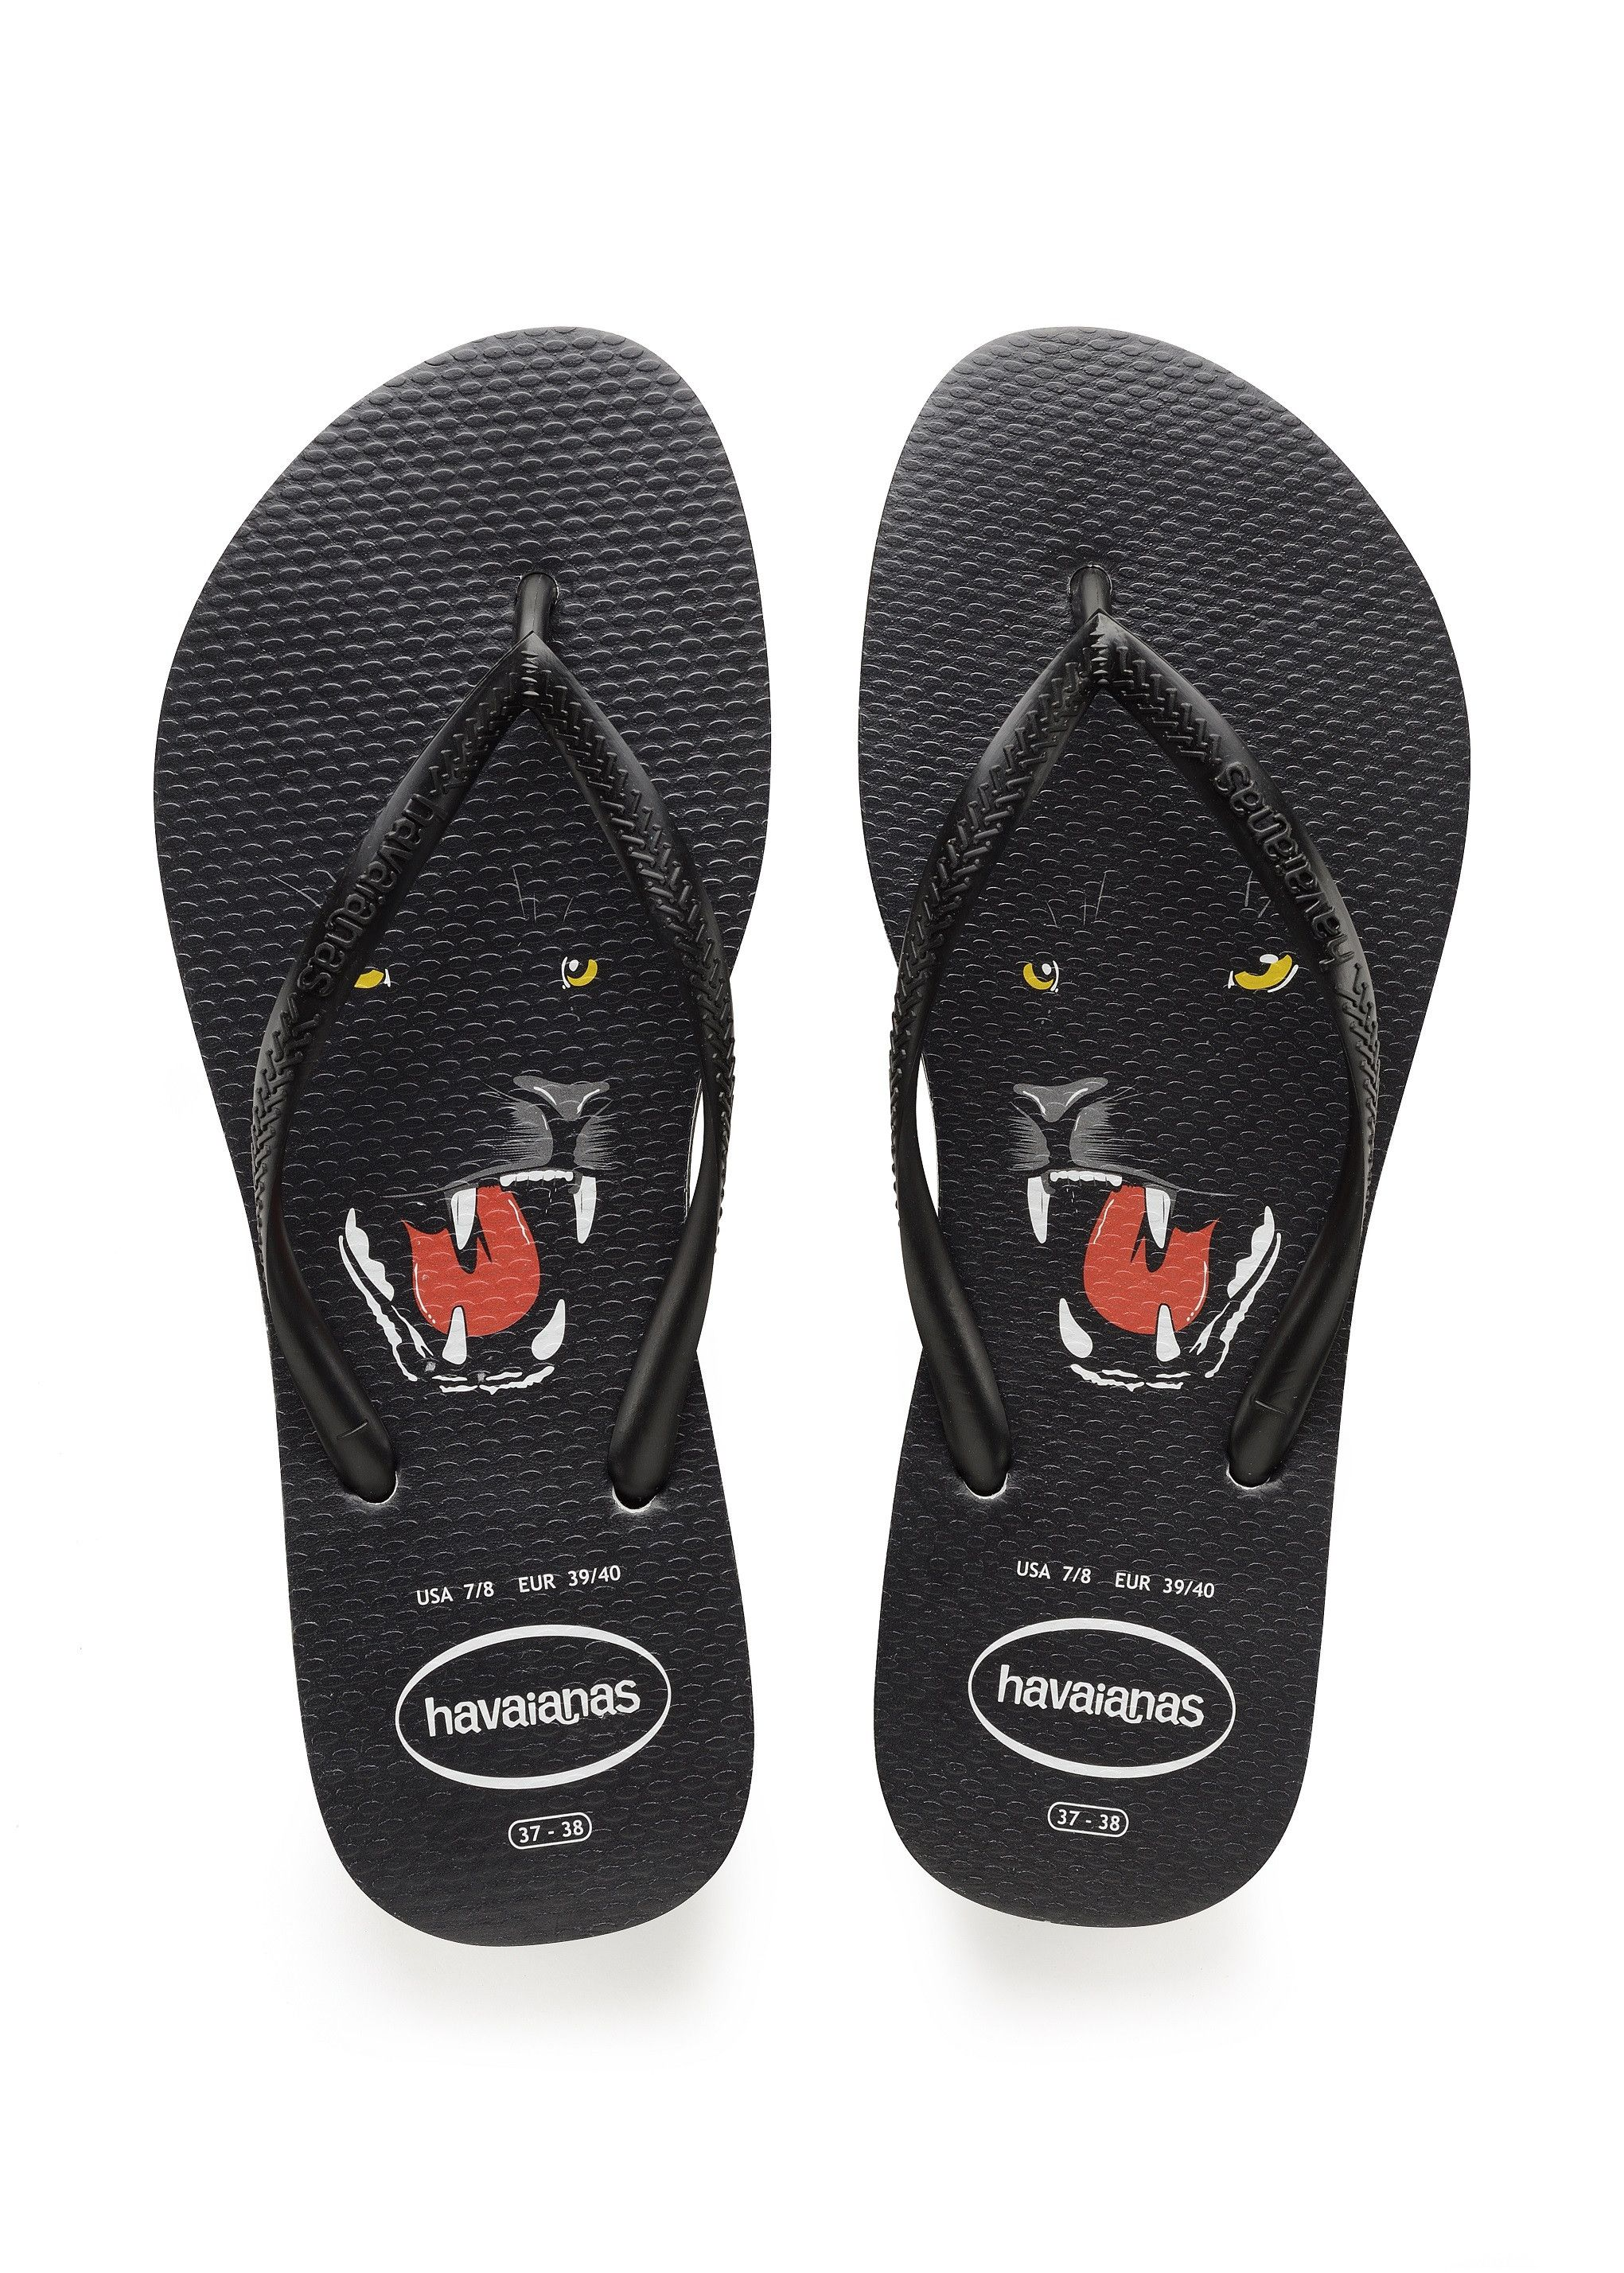 70ec54cbddde Havaianas Slim Wild Sandal Black White Price From  ₩30